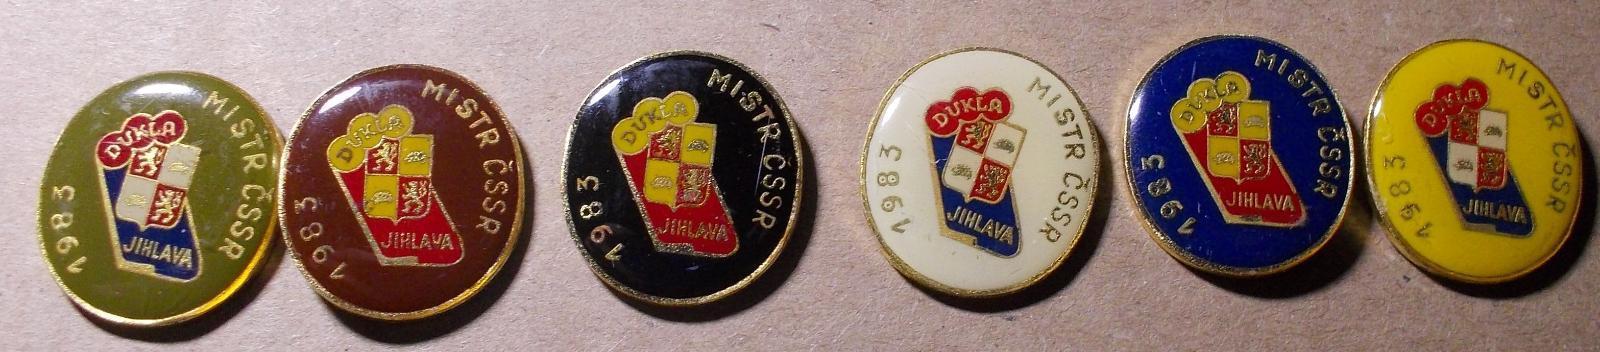 odznaky hokej Dukla Jihlava Mistr 1983 - Faleristika